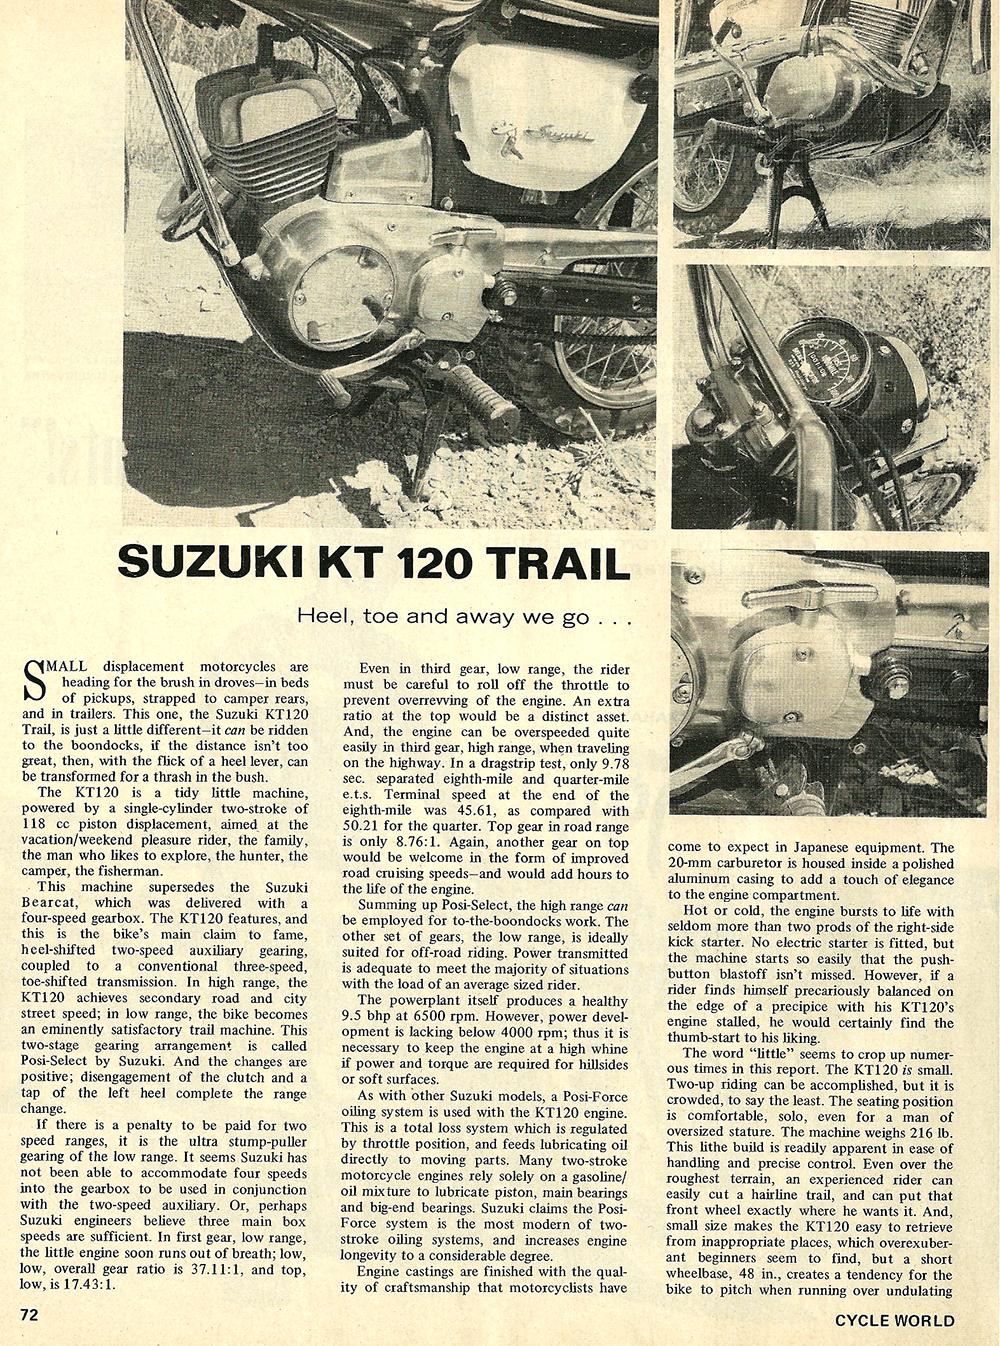 1968 Suzuki KT 120 Trail bike road test 01.jpg